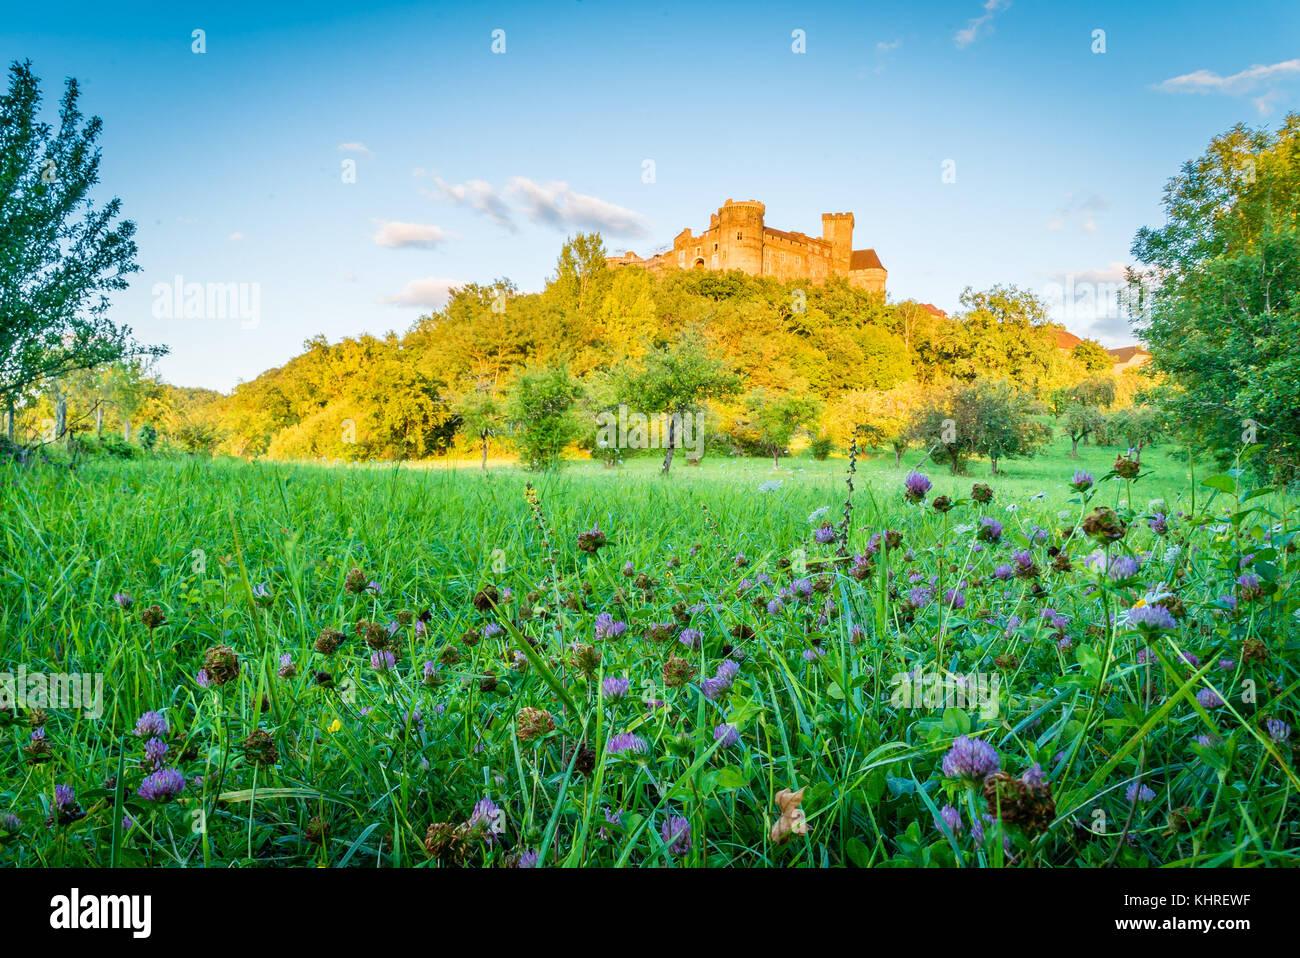 Castelnau castle in Prudhomat Bretenoux France Stock Photo